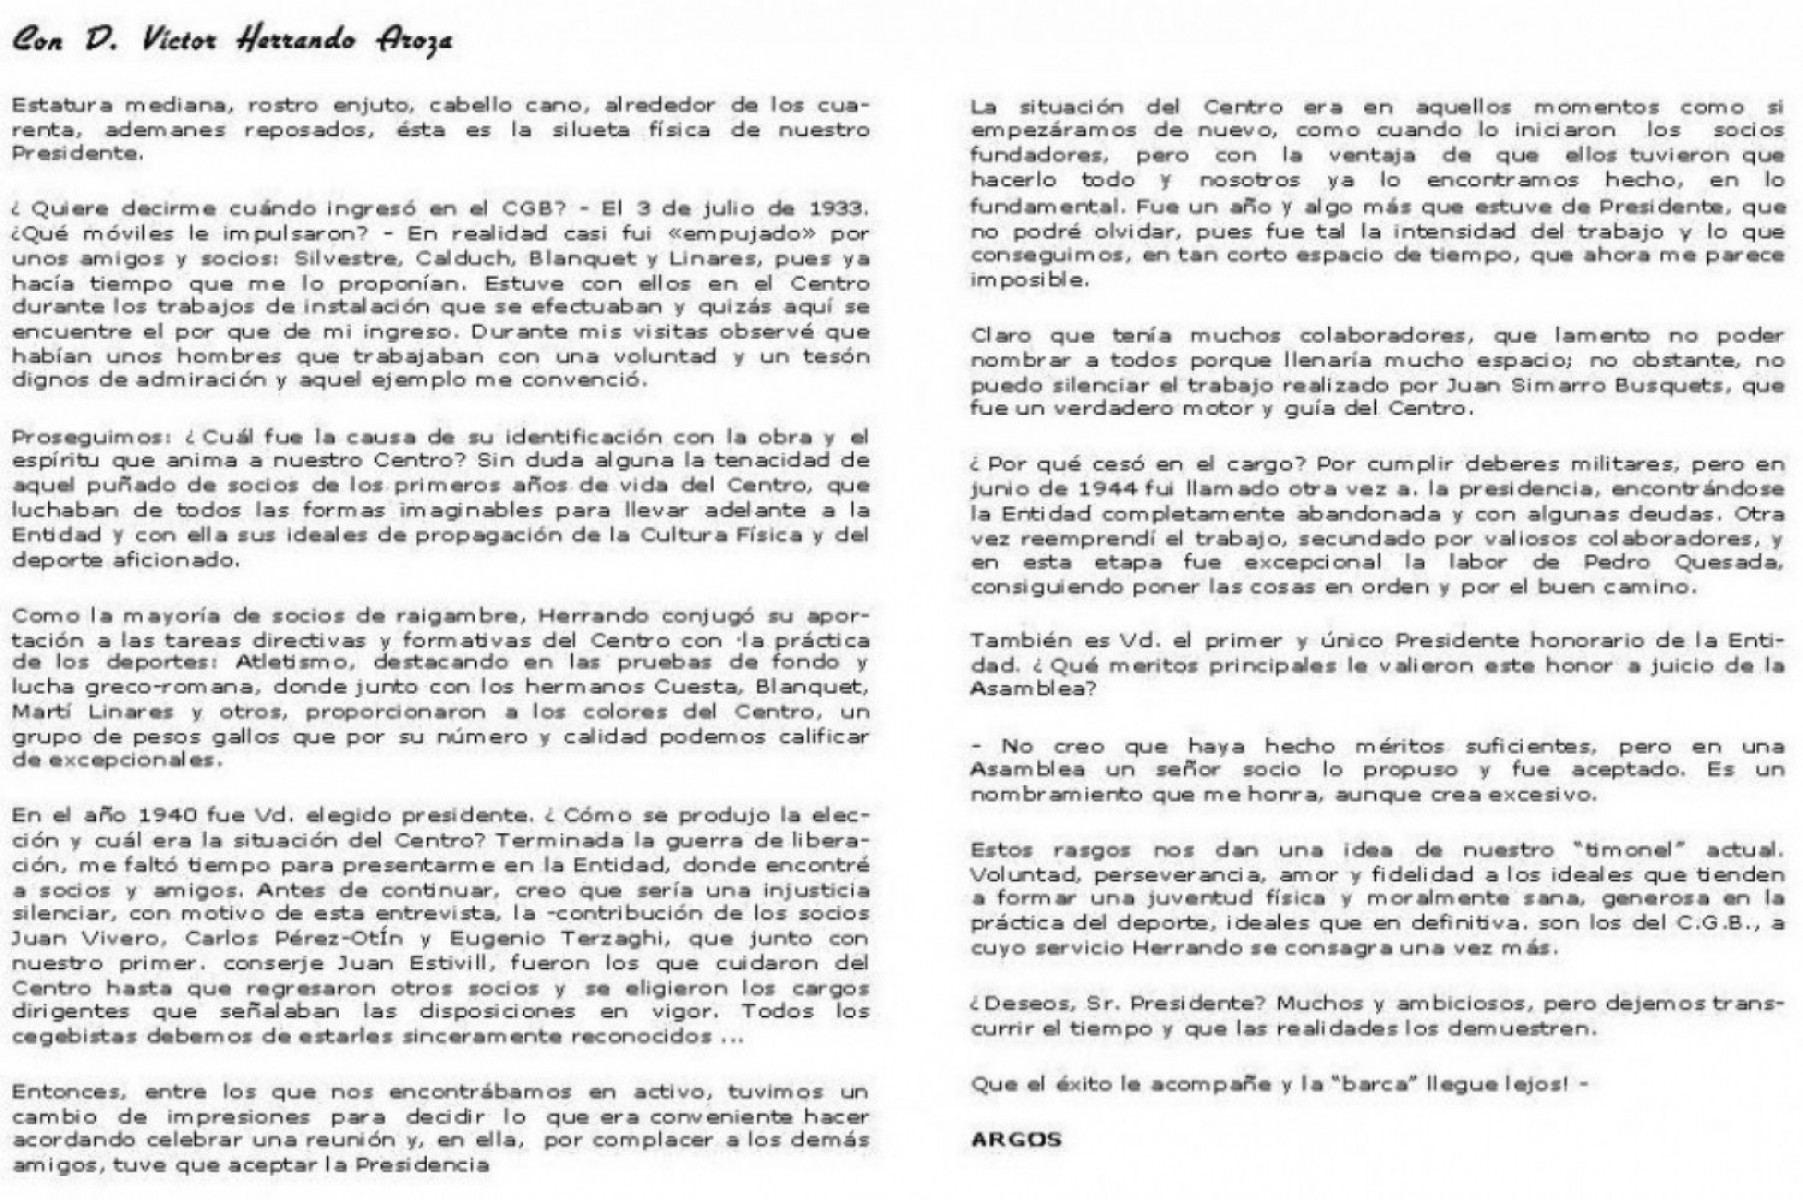 Entrevista a Víctor Herrando any 1958 - 25è Aniversari del CGB